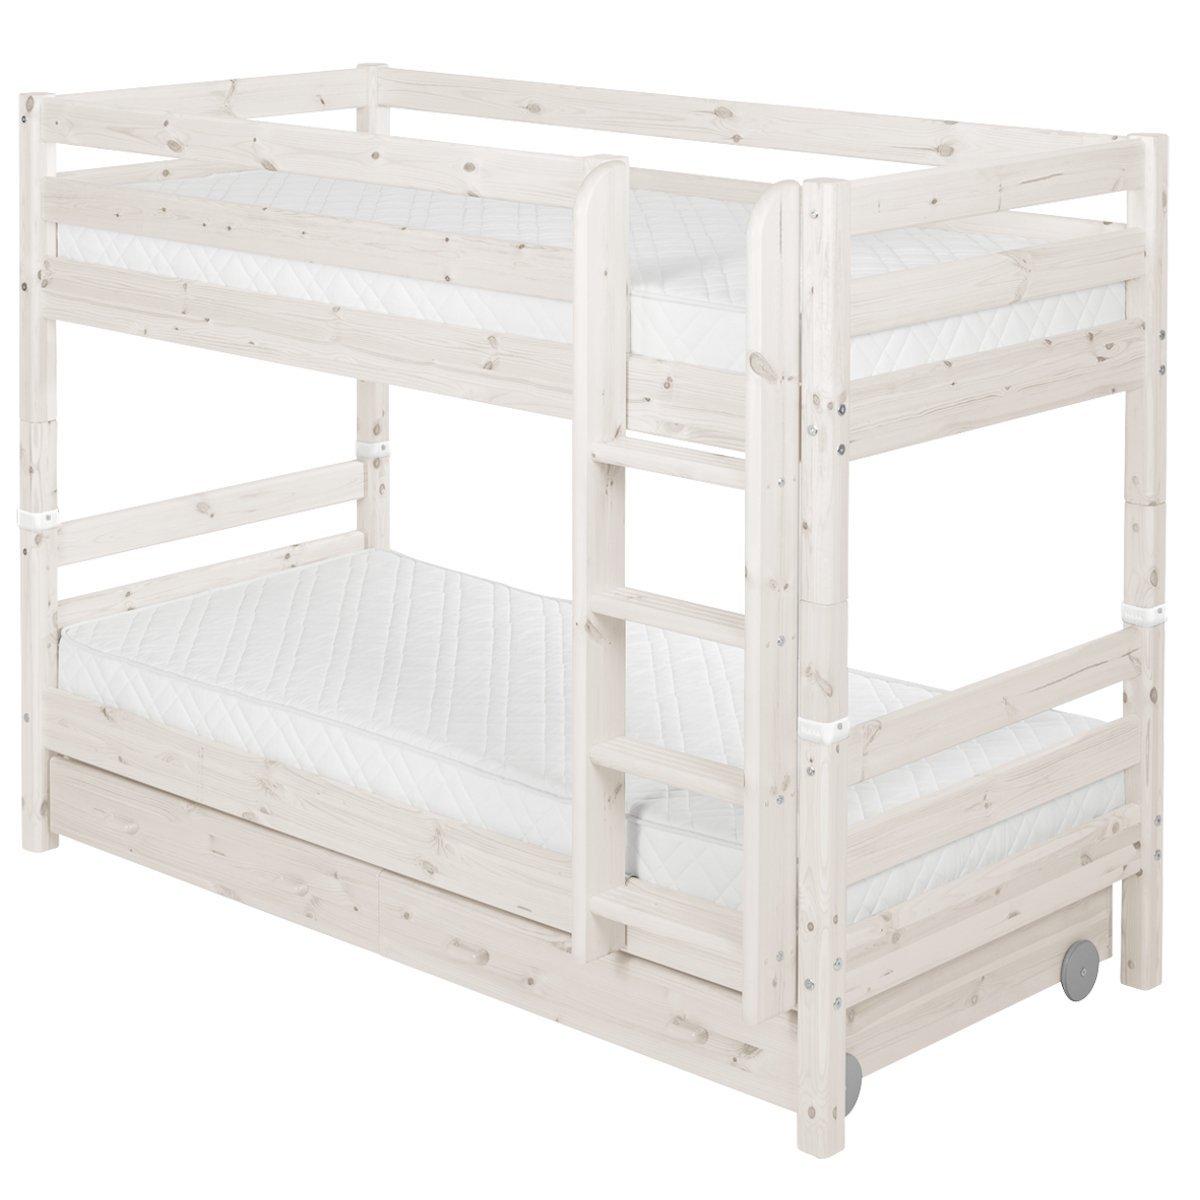 flexa classic etagenbett in wei 90 10177 2 01 913. Black Bedroom Furniture Sets. Home Design Ideas